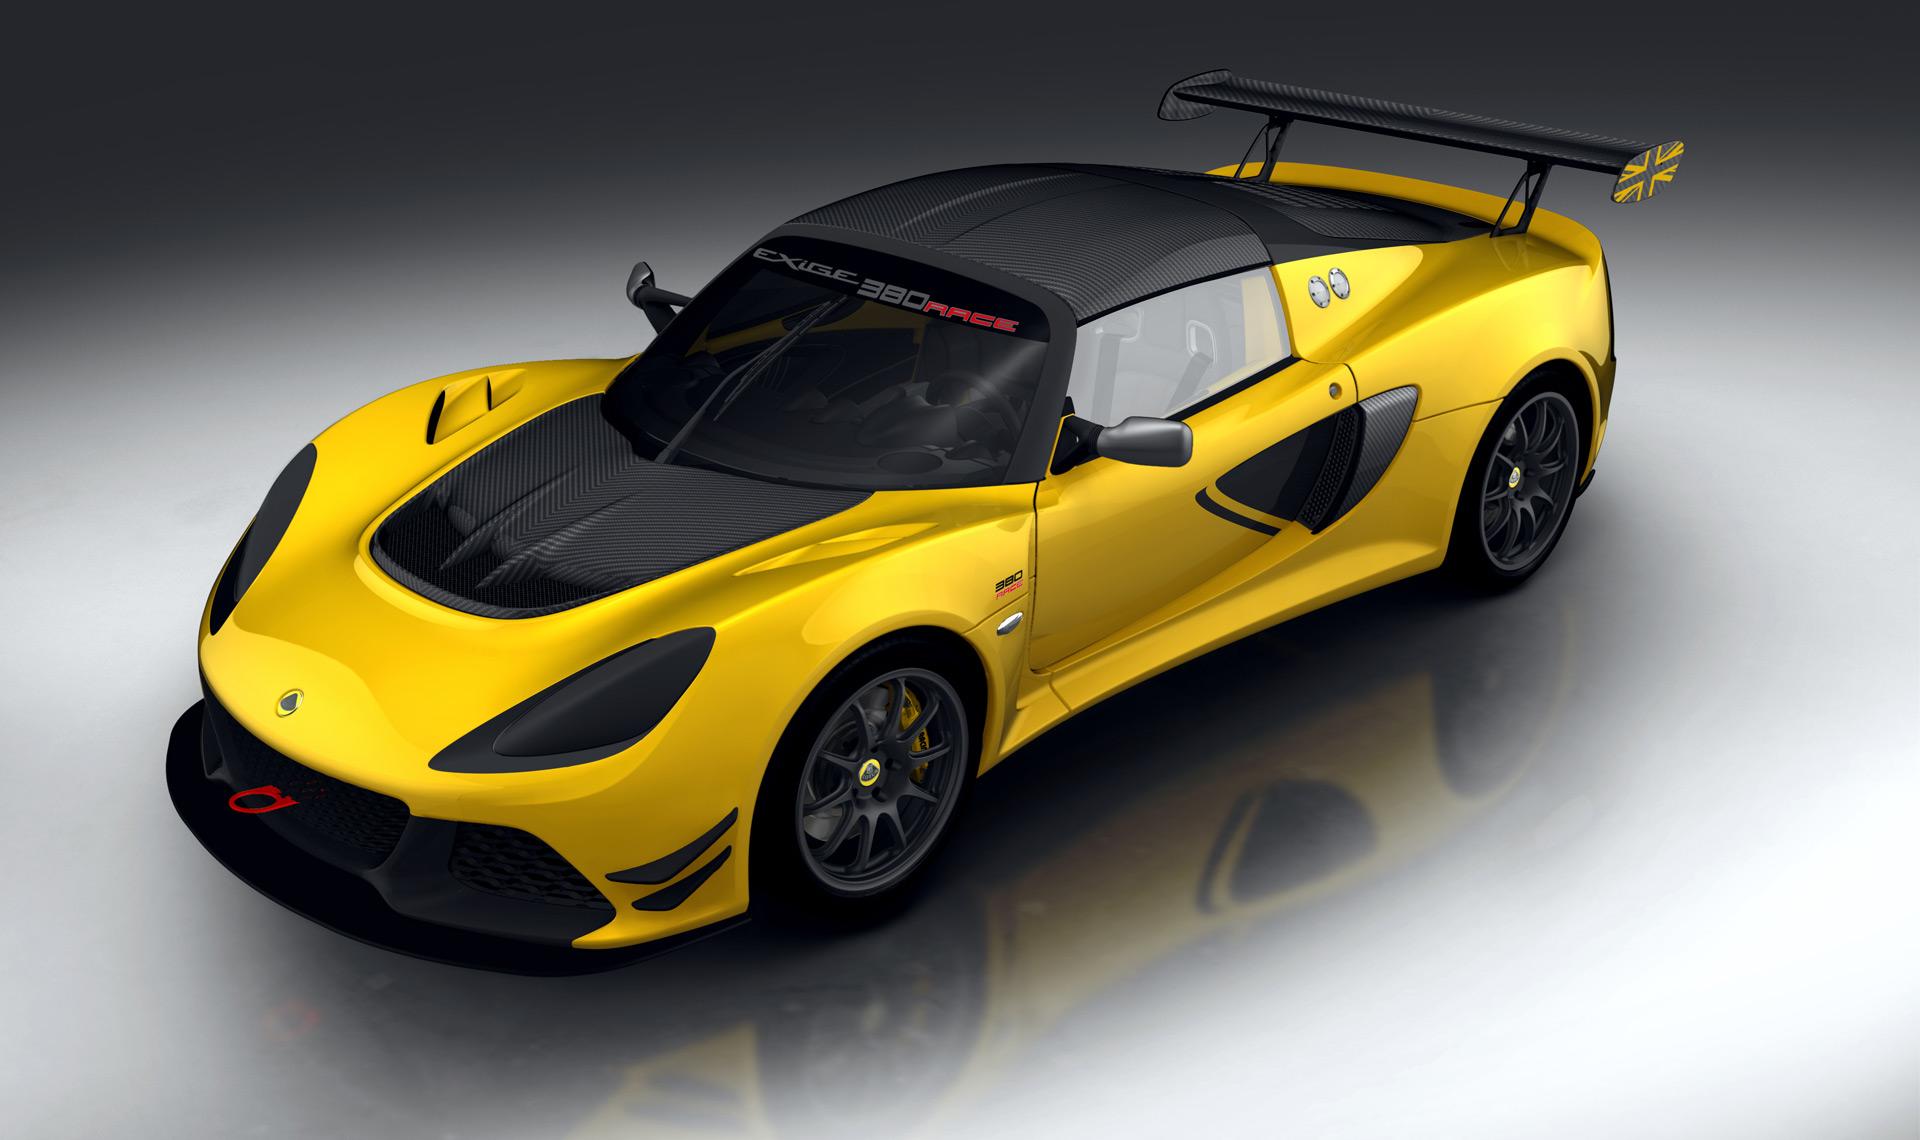 Lotus Exige Sport 380 spawns dedicated track model